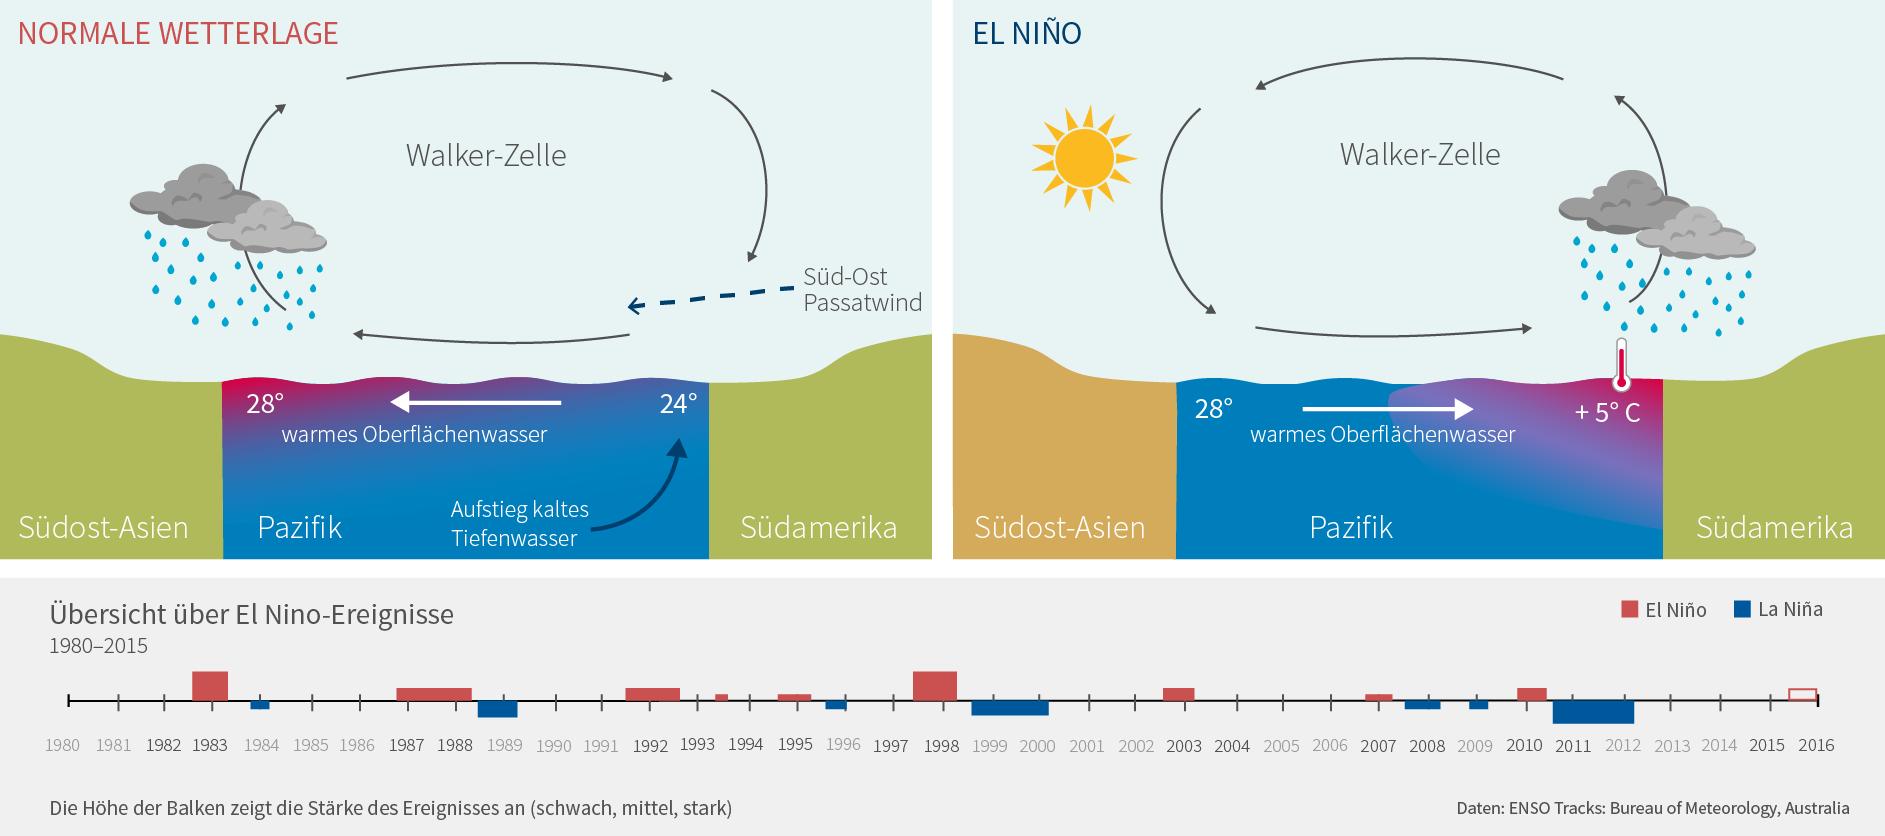 File:ElNino-schematisch-05.png - Wikimedia Commons